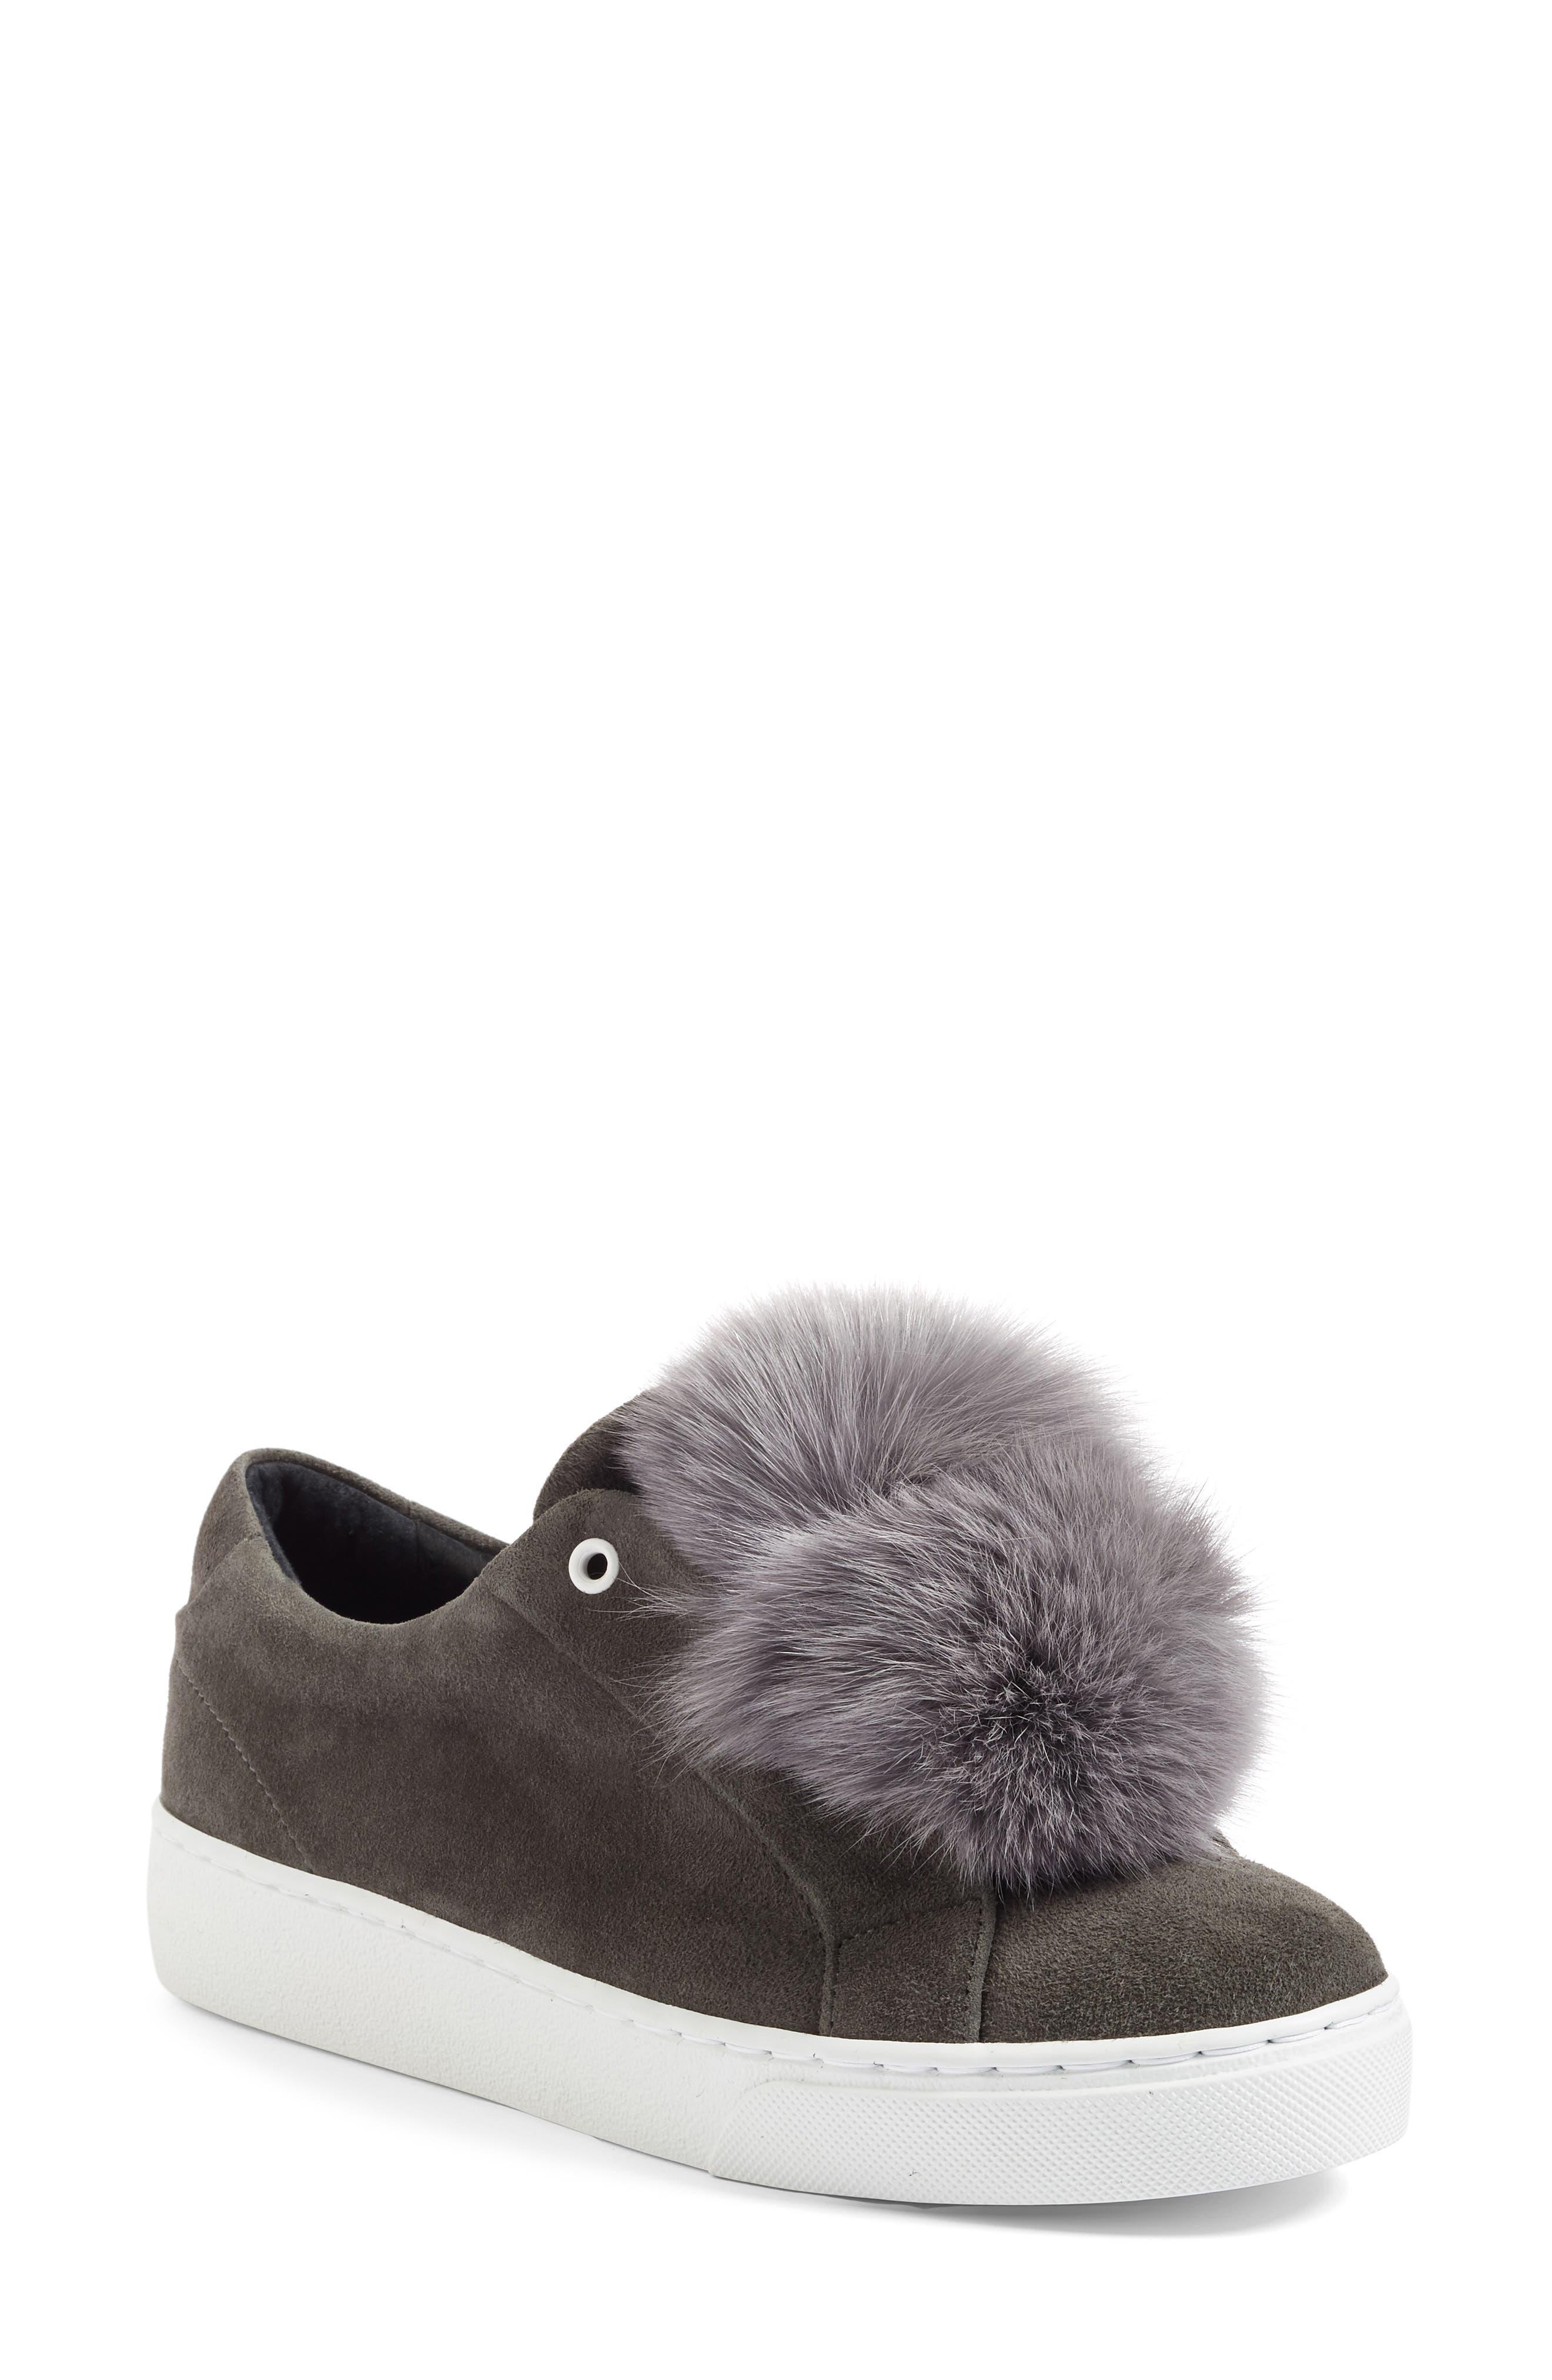 Alternate Image 1 Selected - Here / Now Heather Genuine Fox Fur Trim Sneaker (Women)